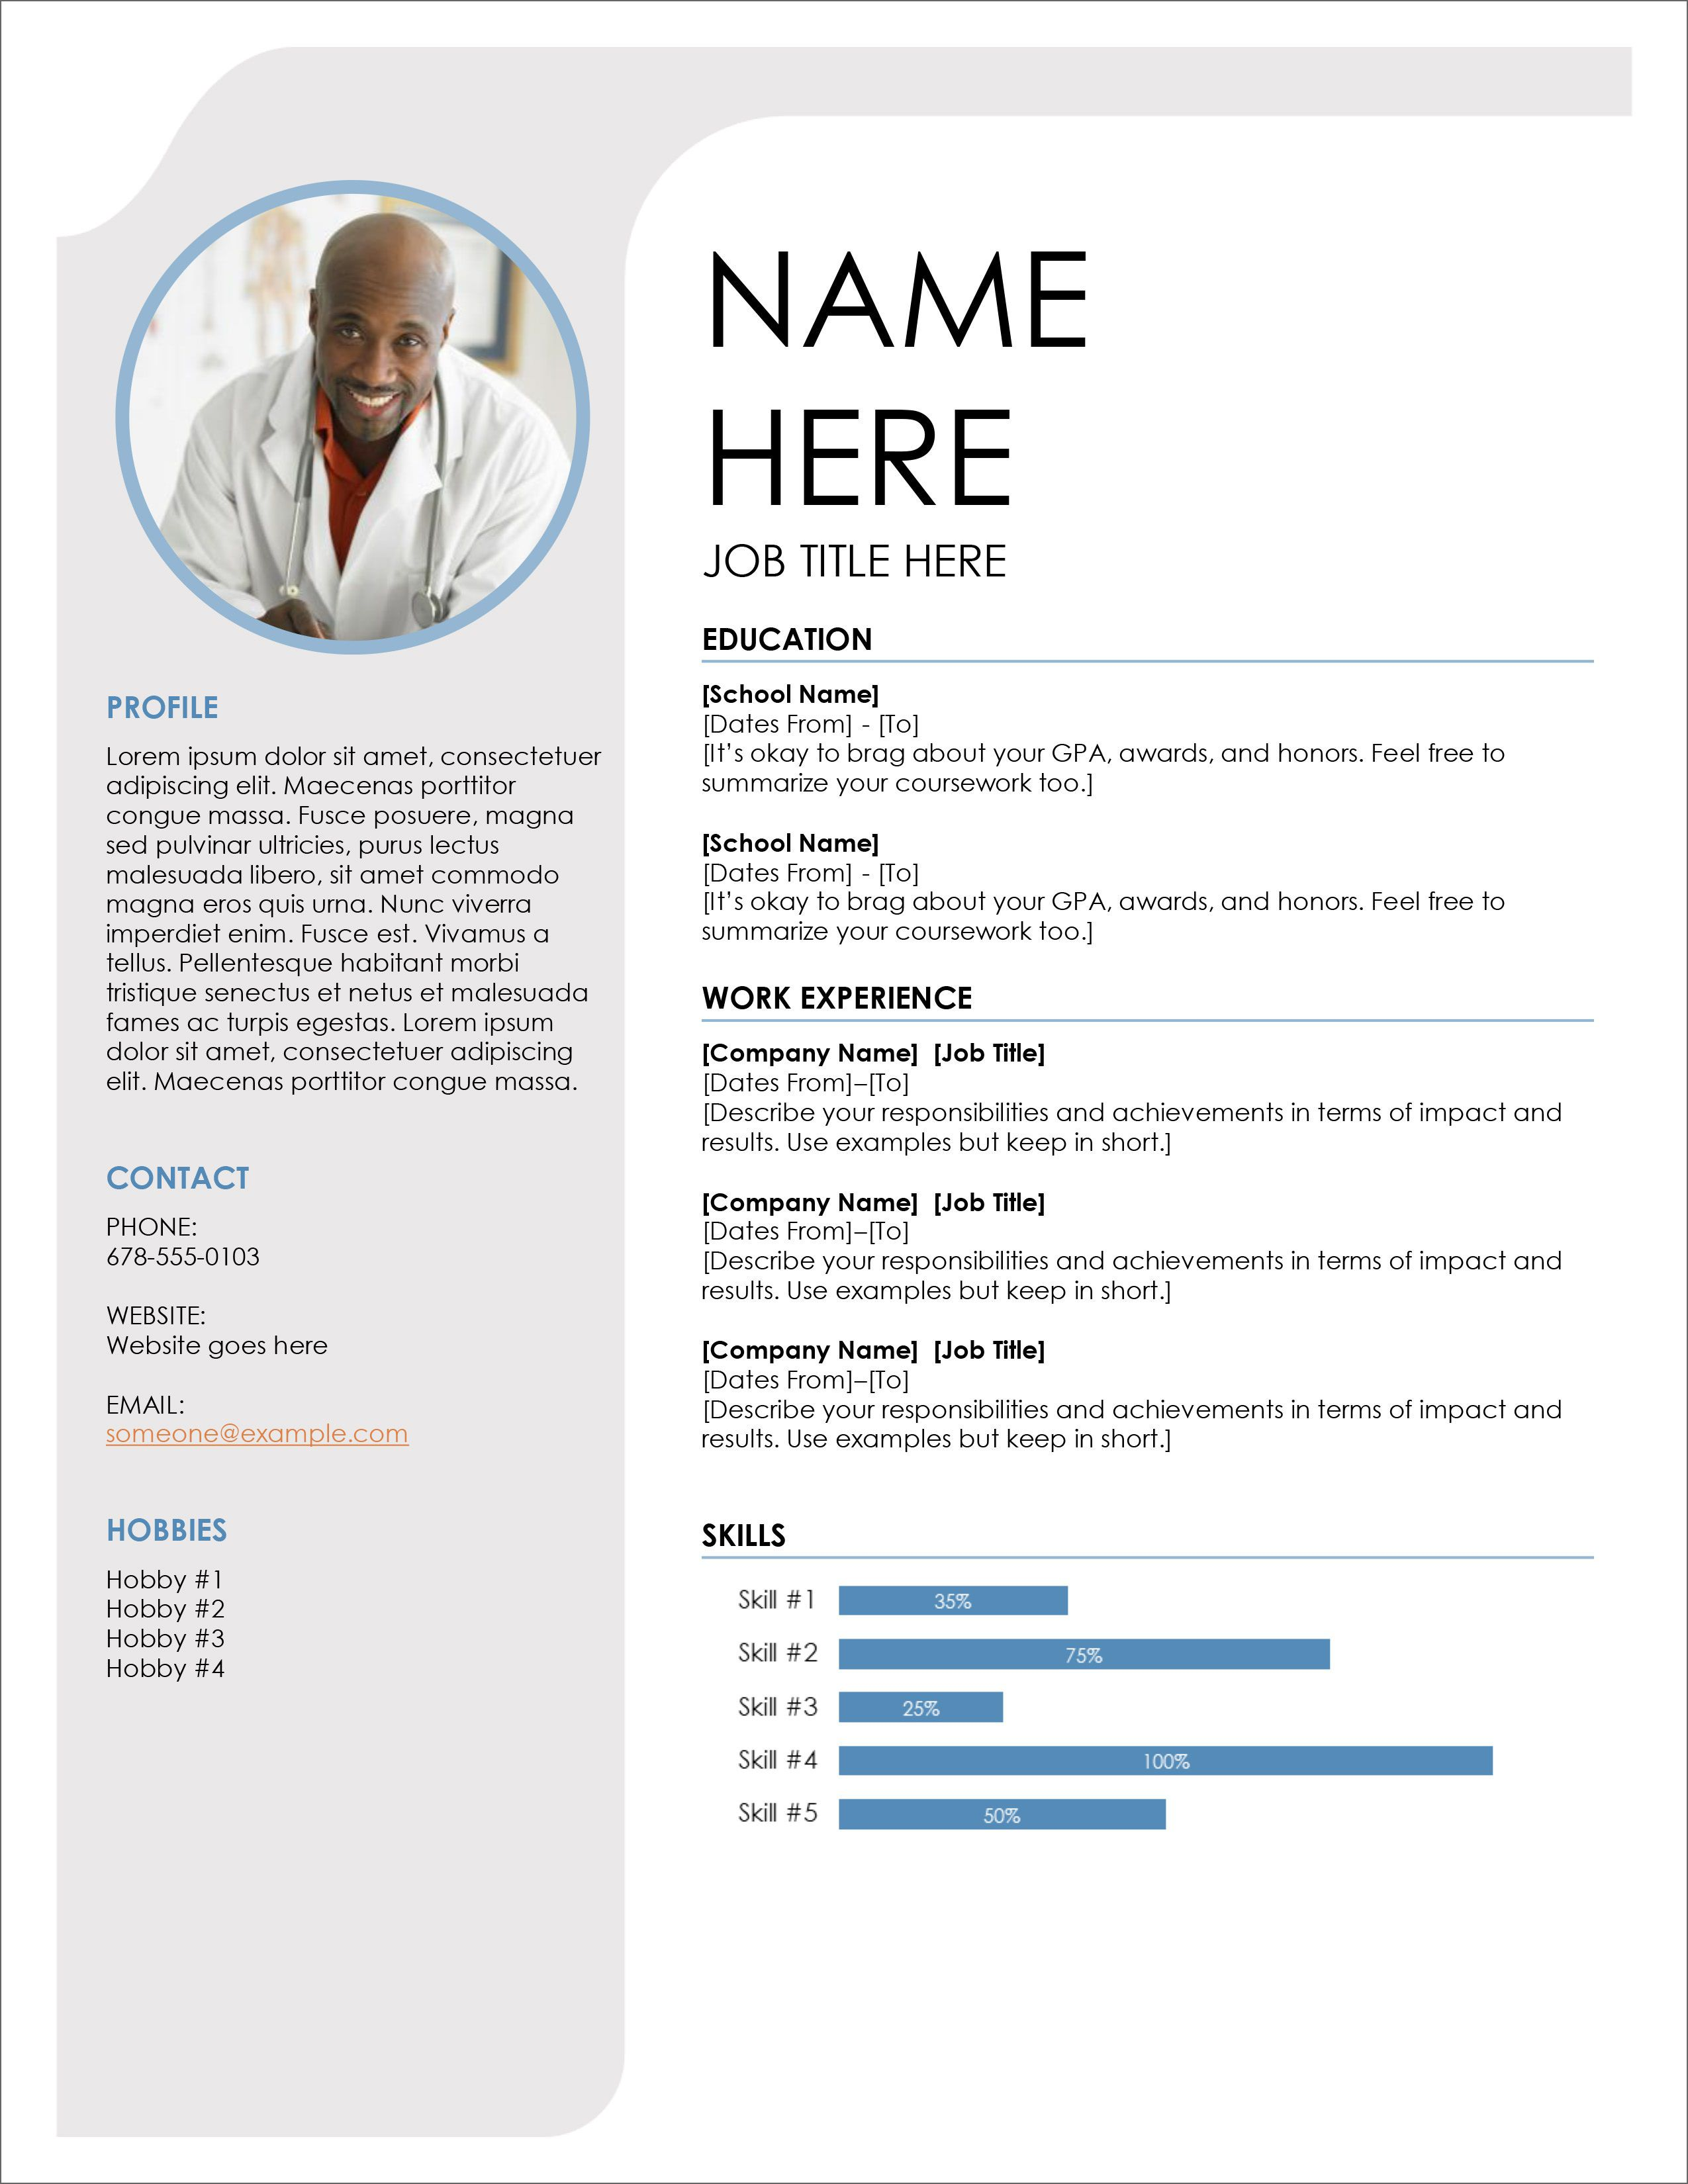 008 Wondrou Free Professional Resume Template Microsoft Word High Definition  Cv 2010Full